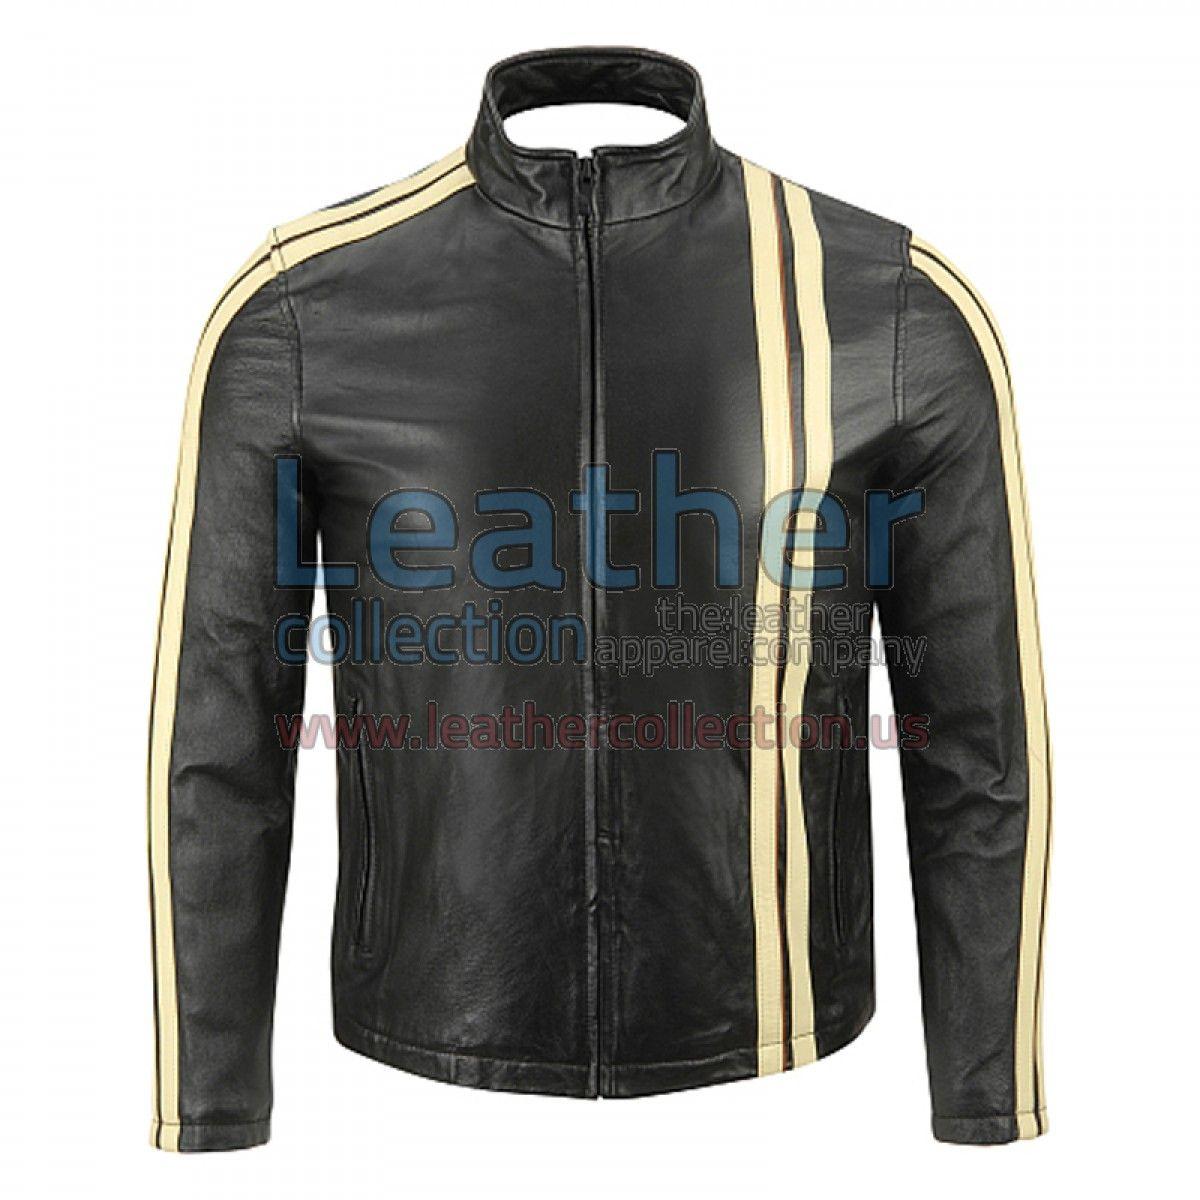 Leather jacket yellow stripe - Vertical Stripe Leather Jacket Genuine Leather 0 9 1 0 Mm Original Ykk Full